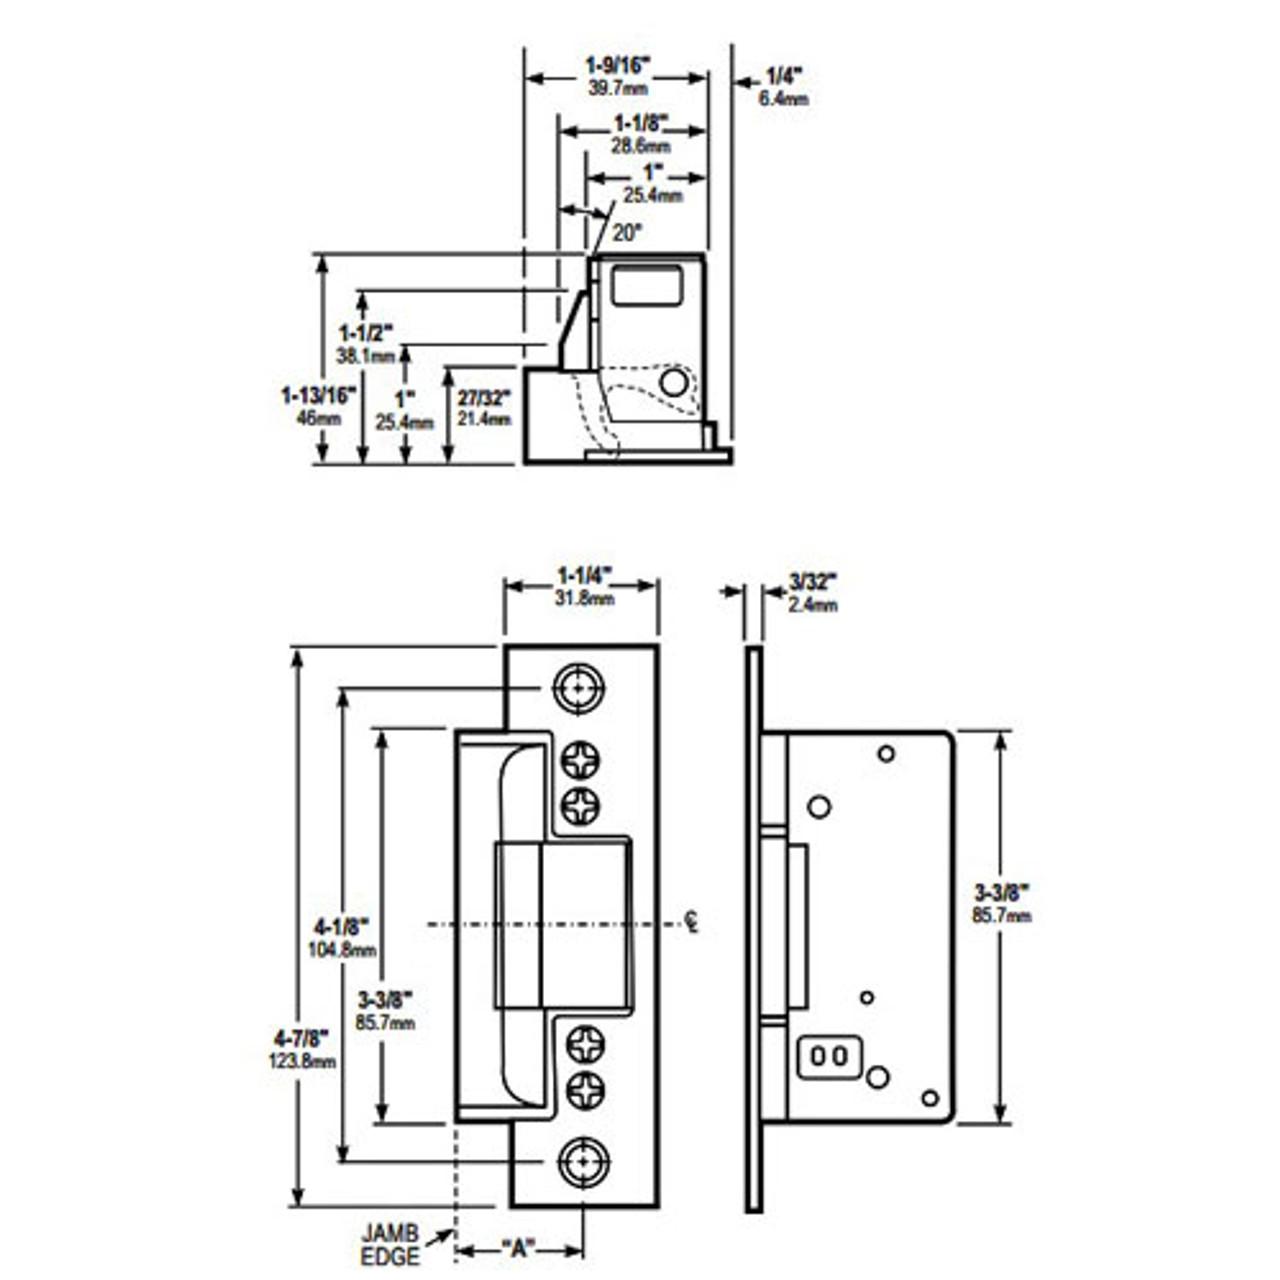 7170-547-628-50 Adams Rite Electric Strike Dimensional View